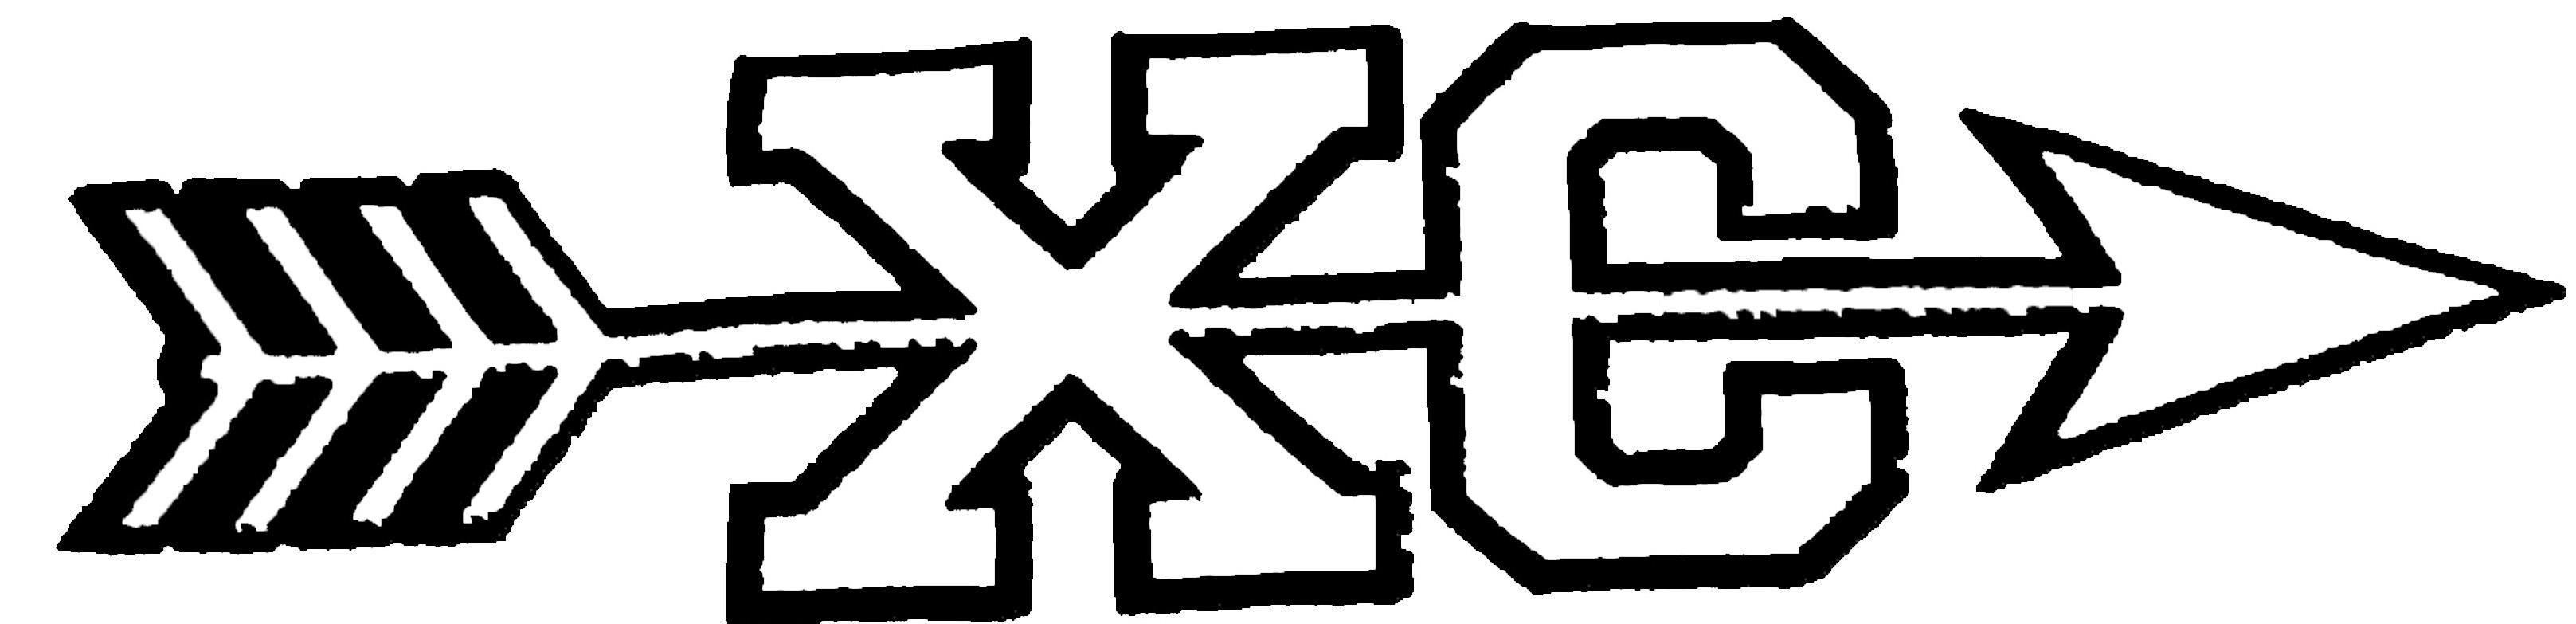 Cross Country Logo Clip Art - Gallery